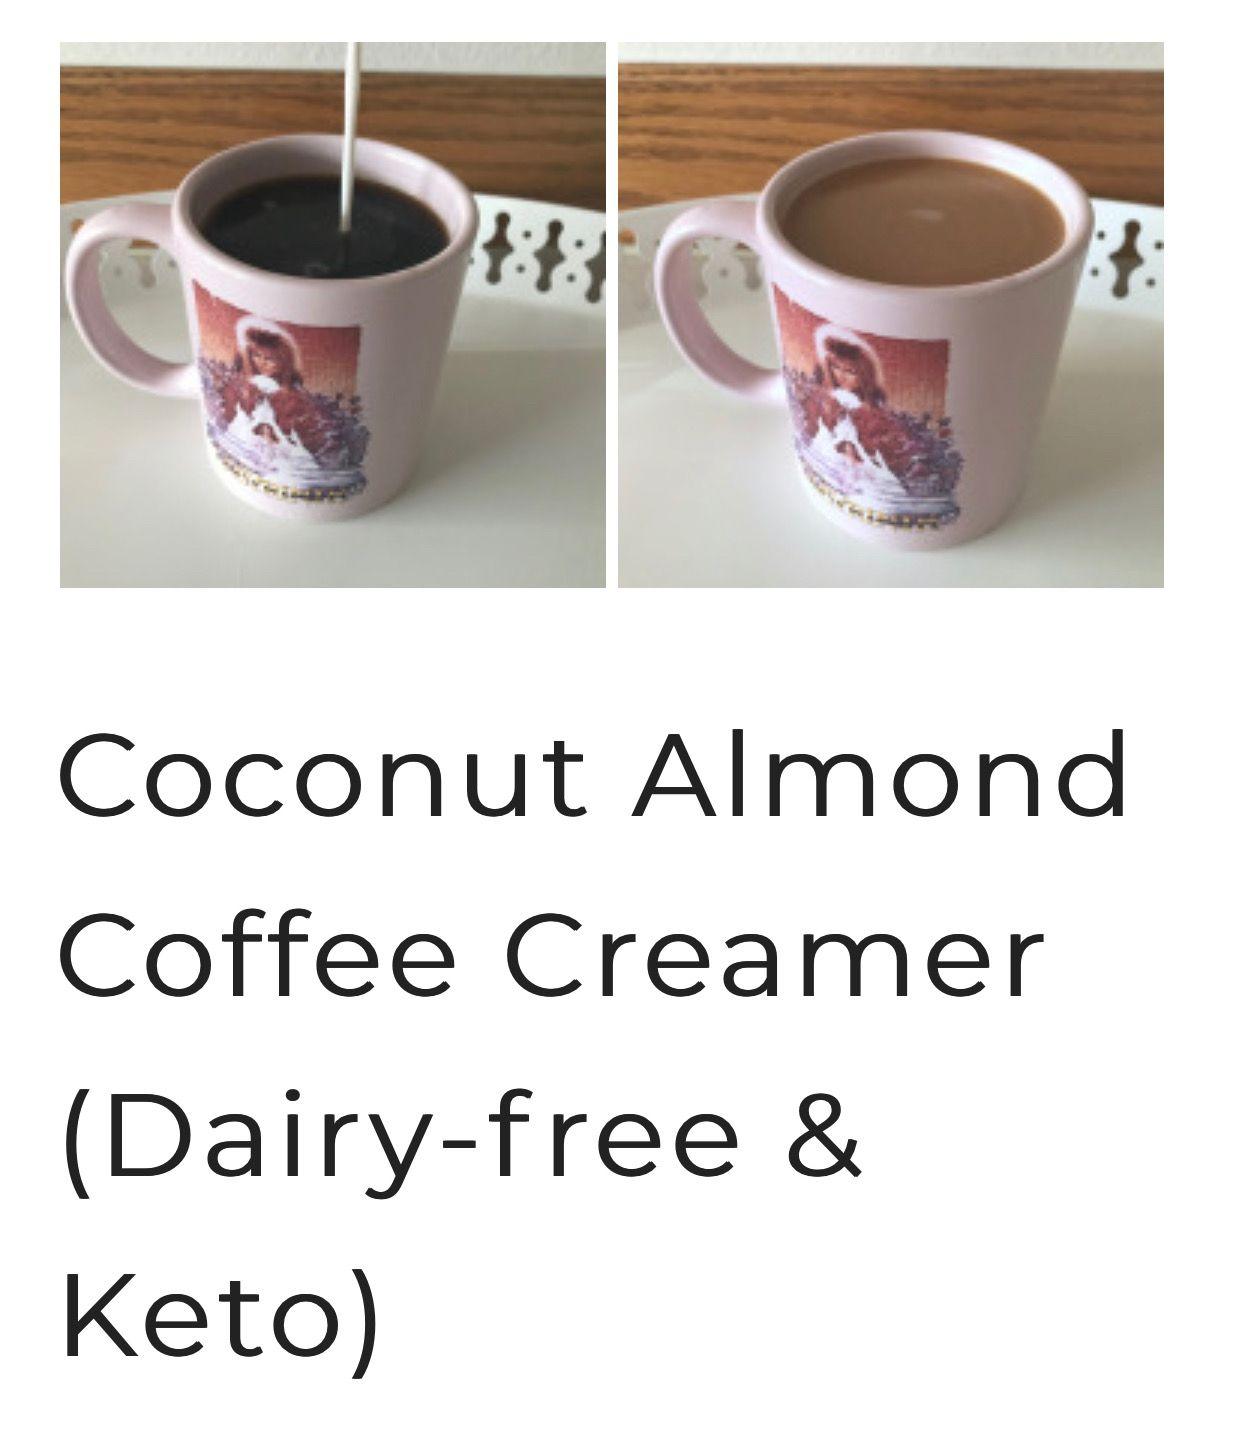 Coconut almond coffee creamer dairyfree keto coffee